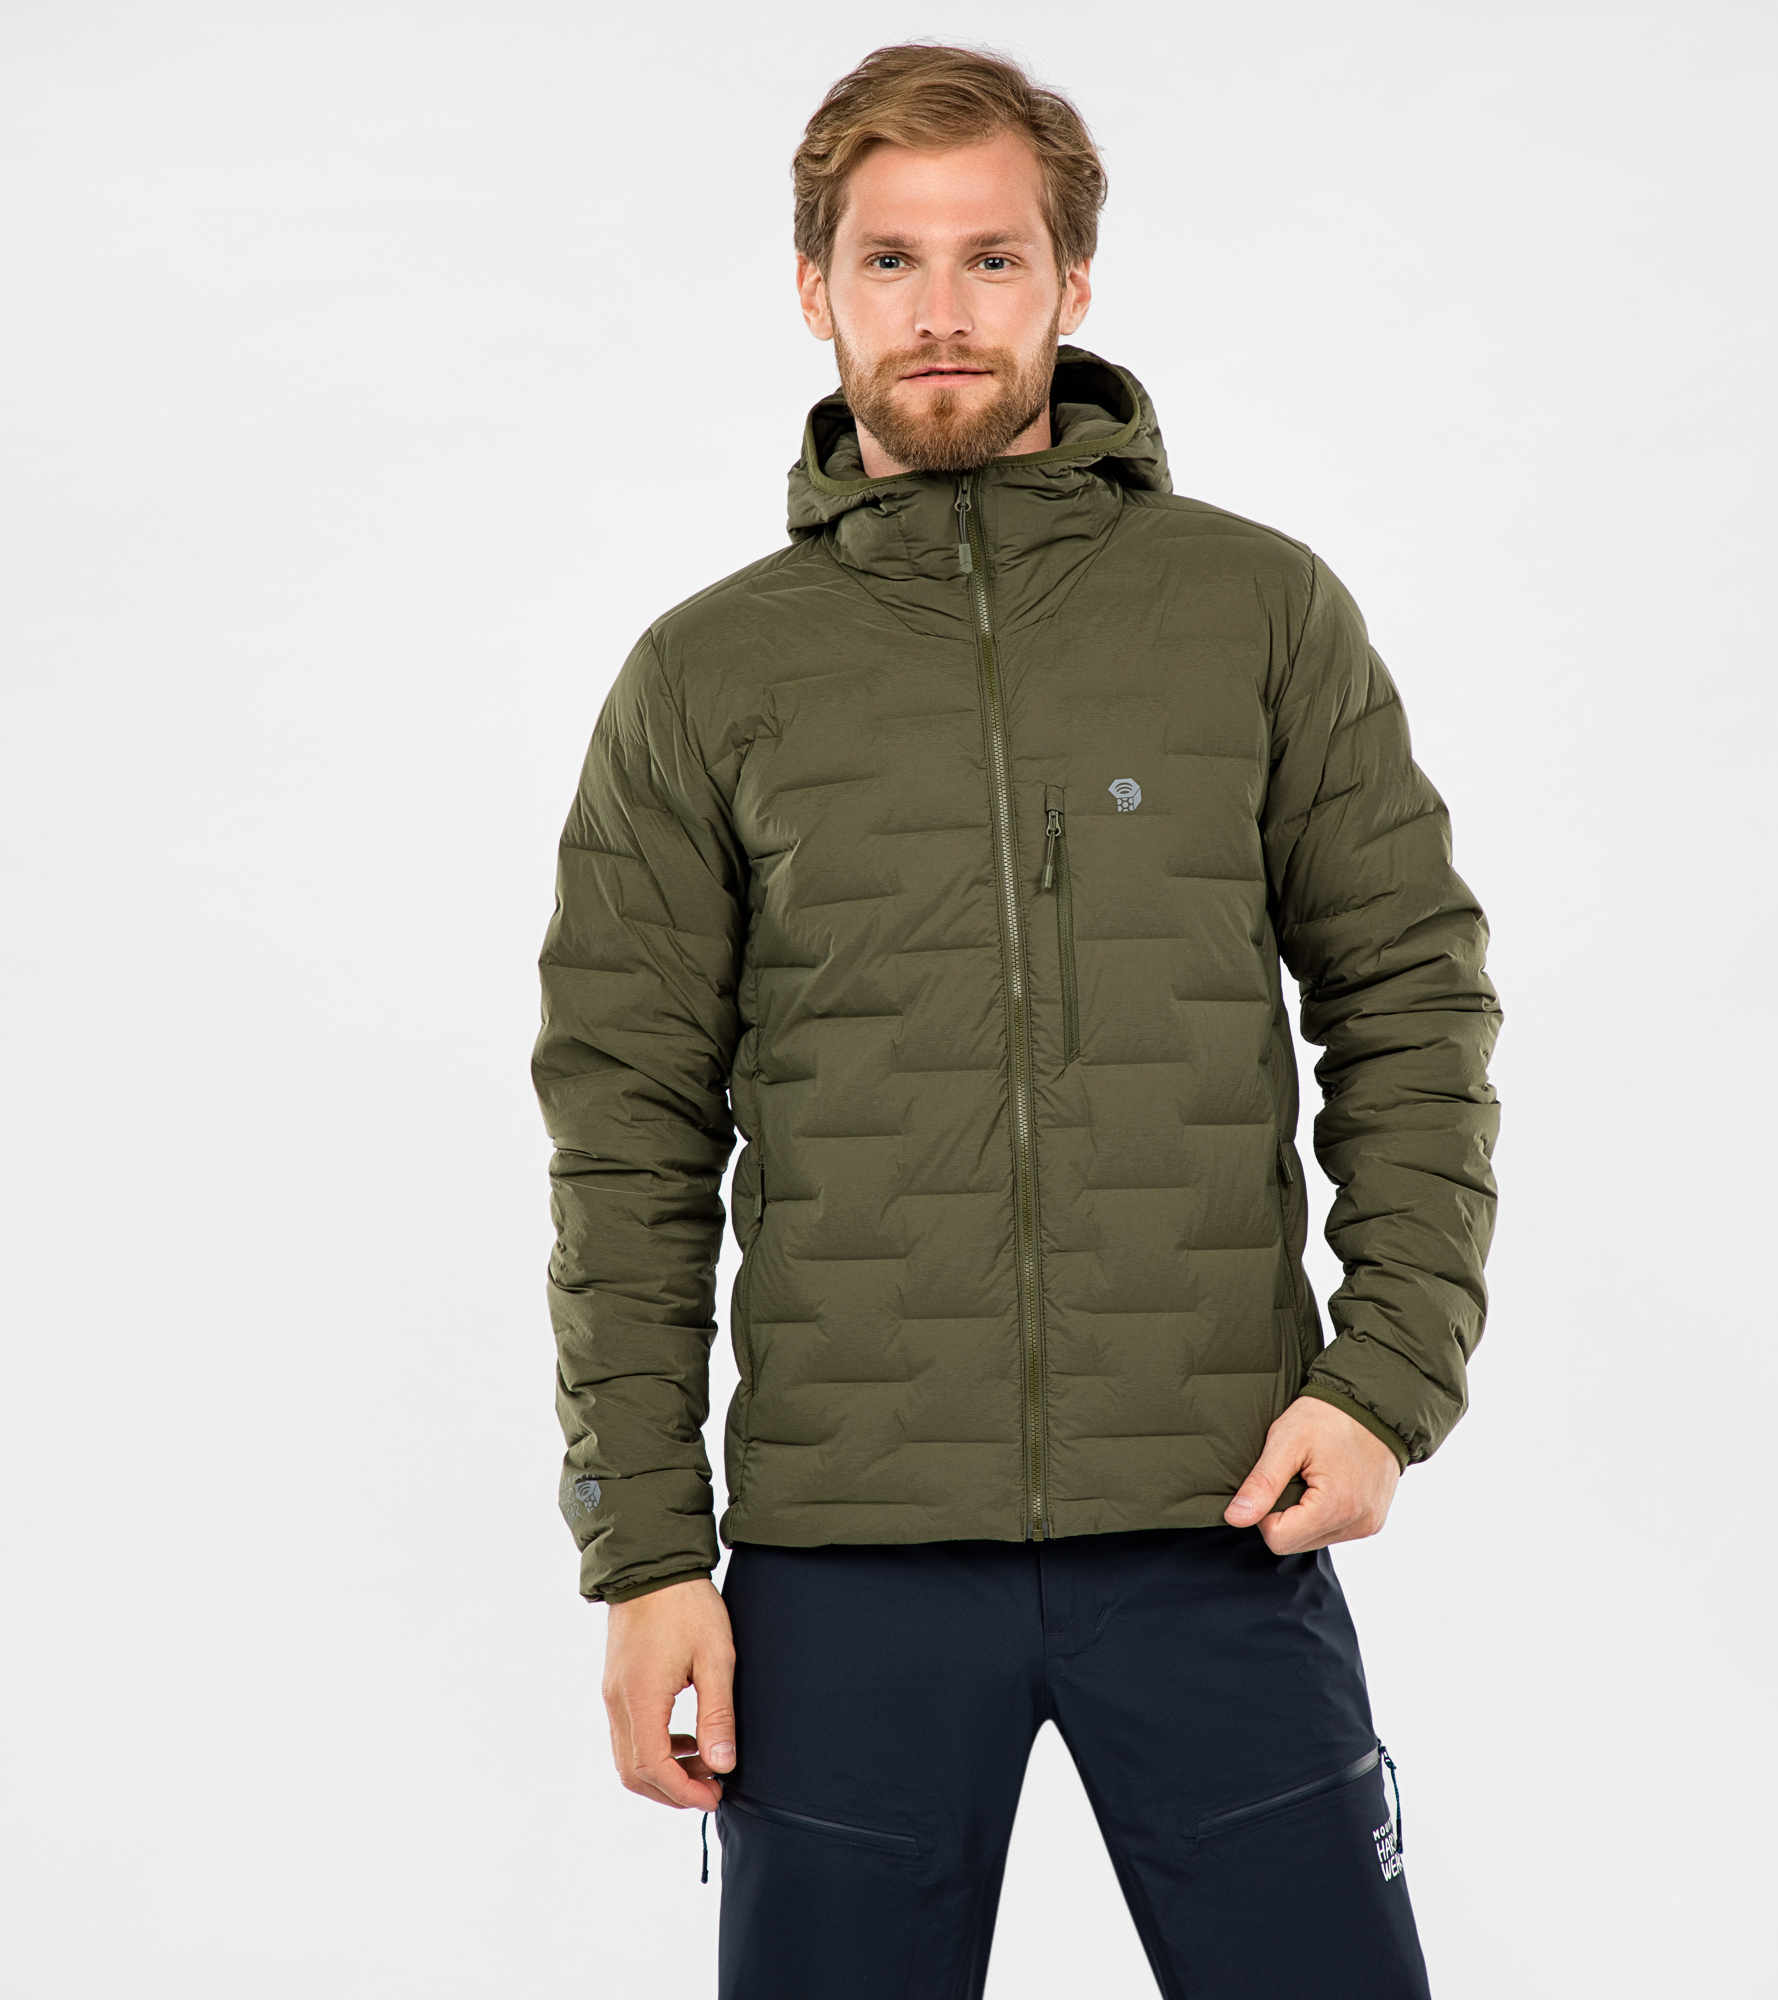 Mountain Hardwear Куртка пуховая мужская Hardwear, размер 56